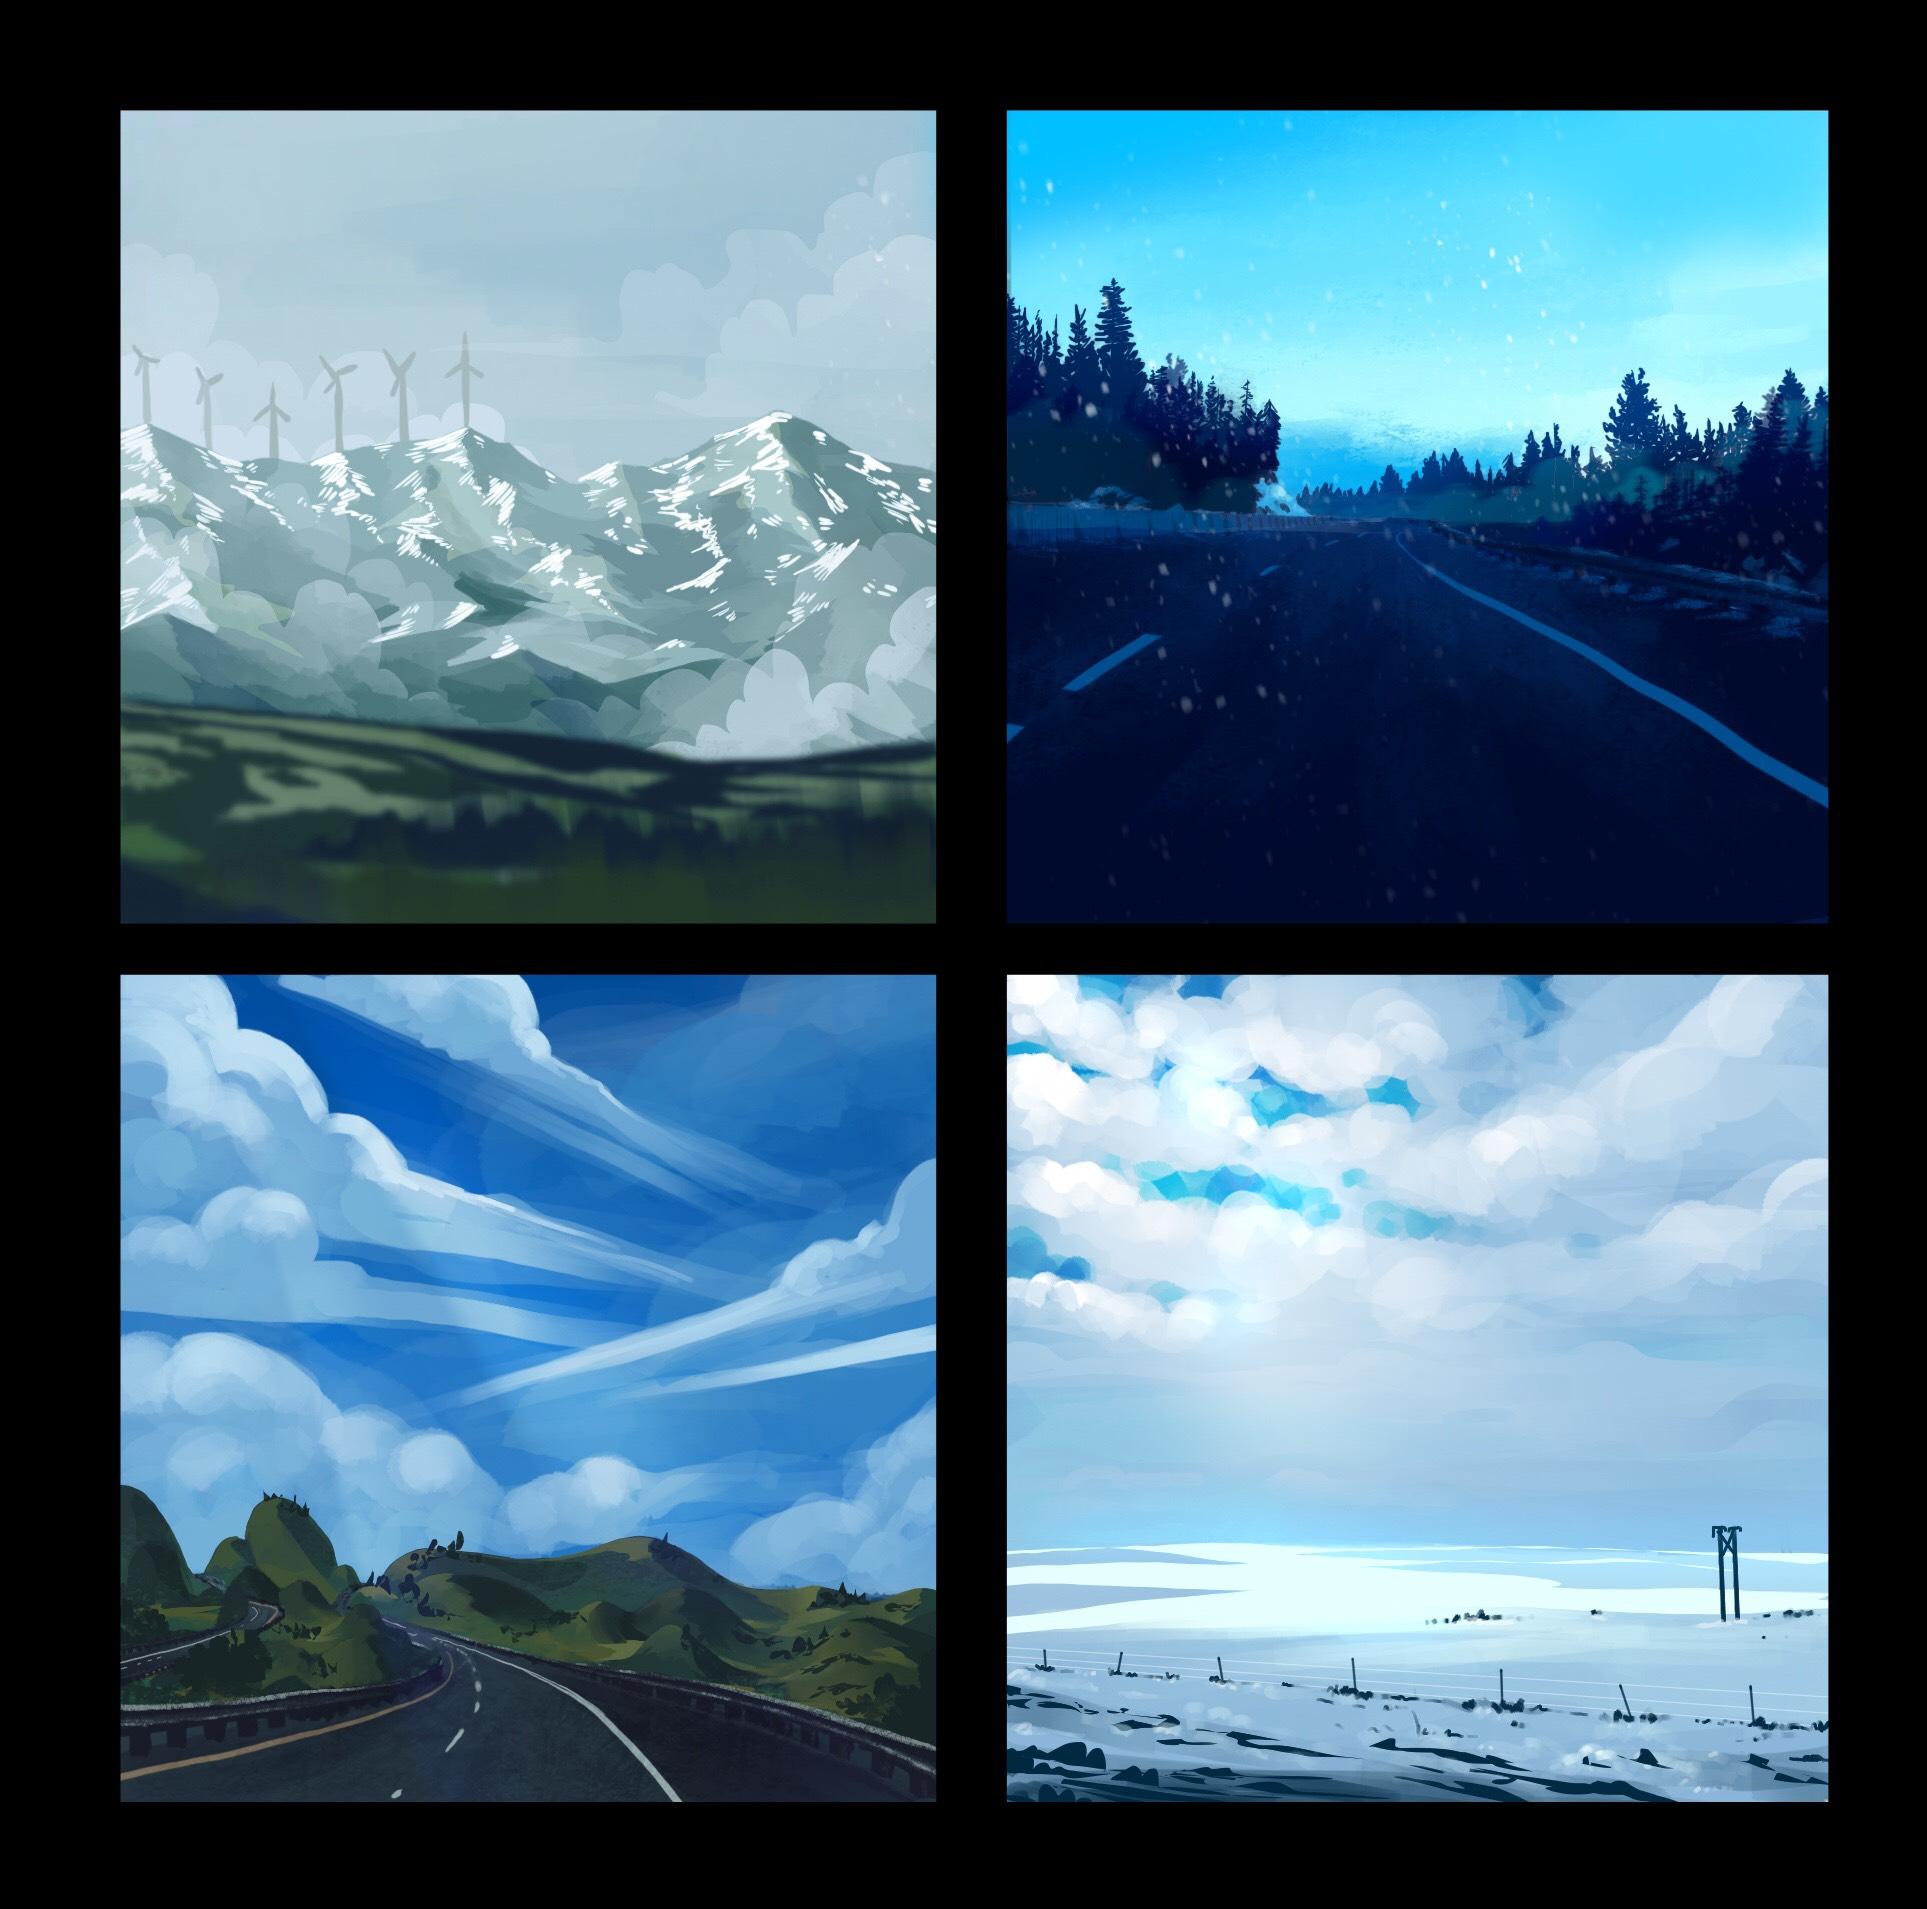 Studies based of photos taken on road trip. Programs: Procreate, Photoshop